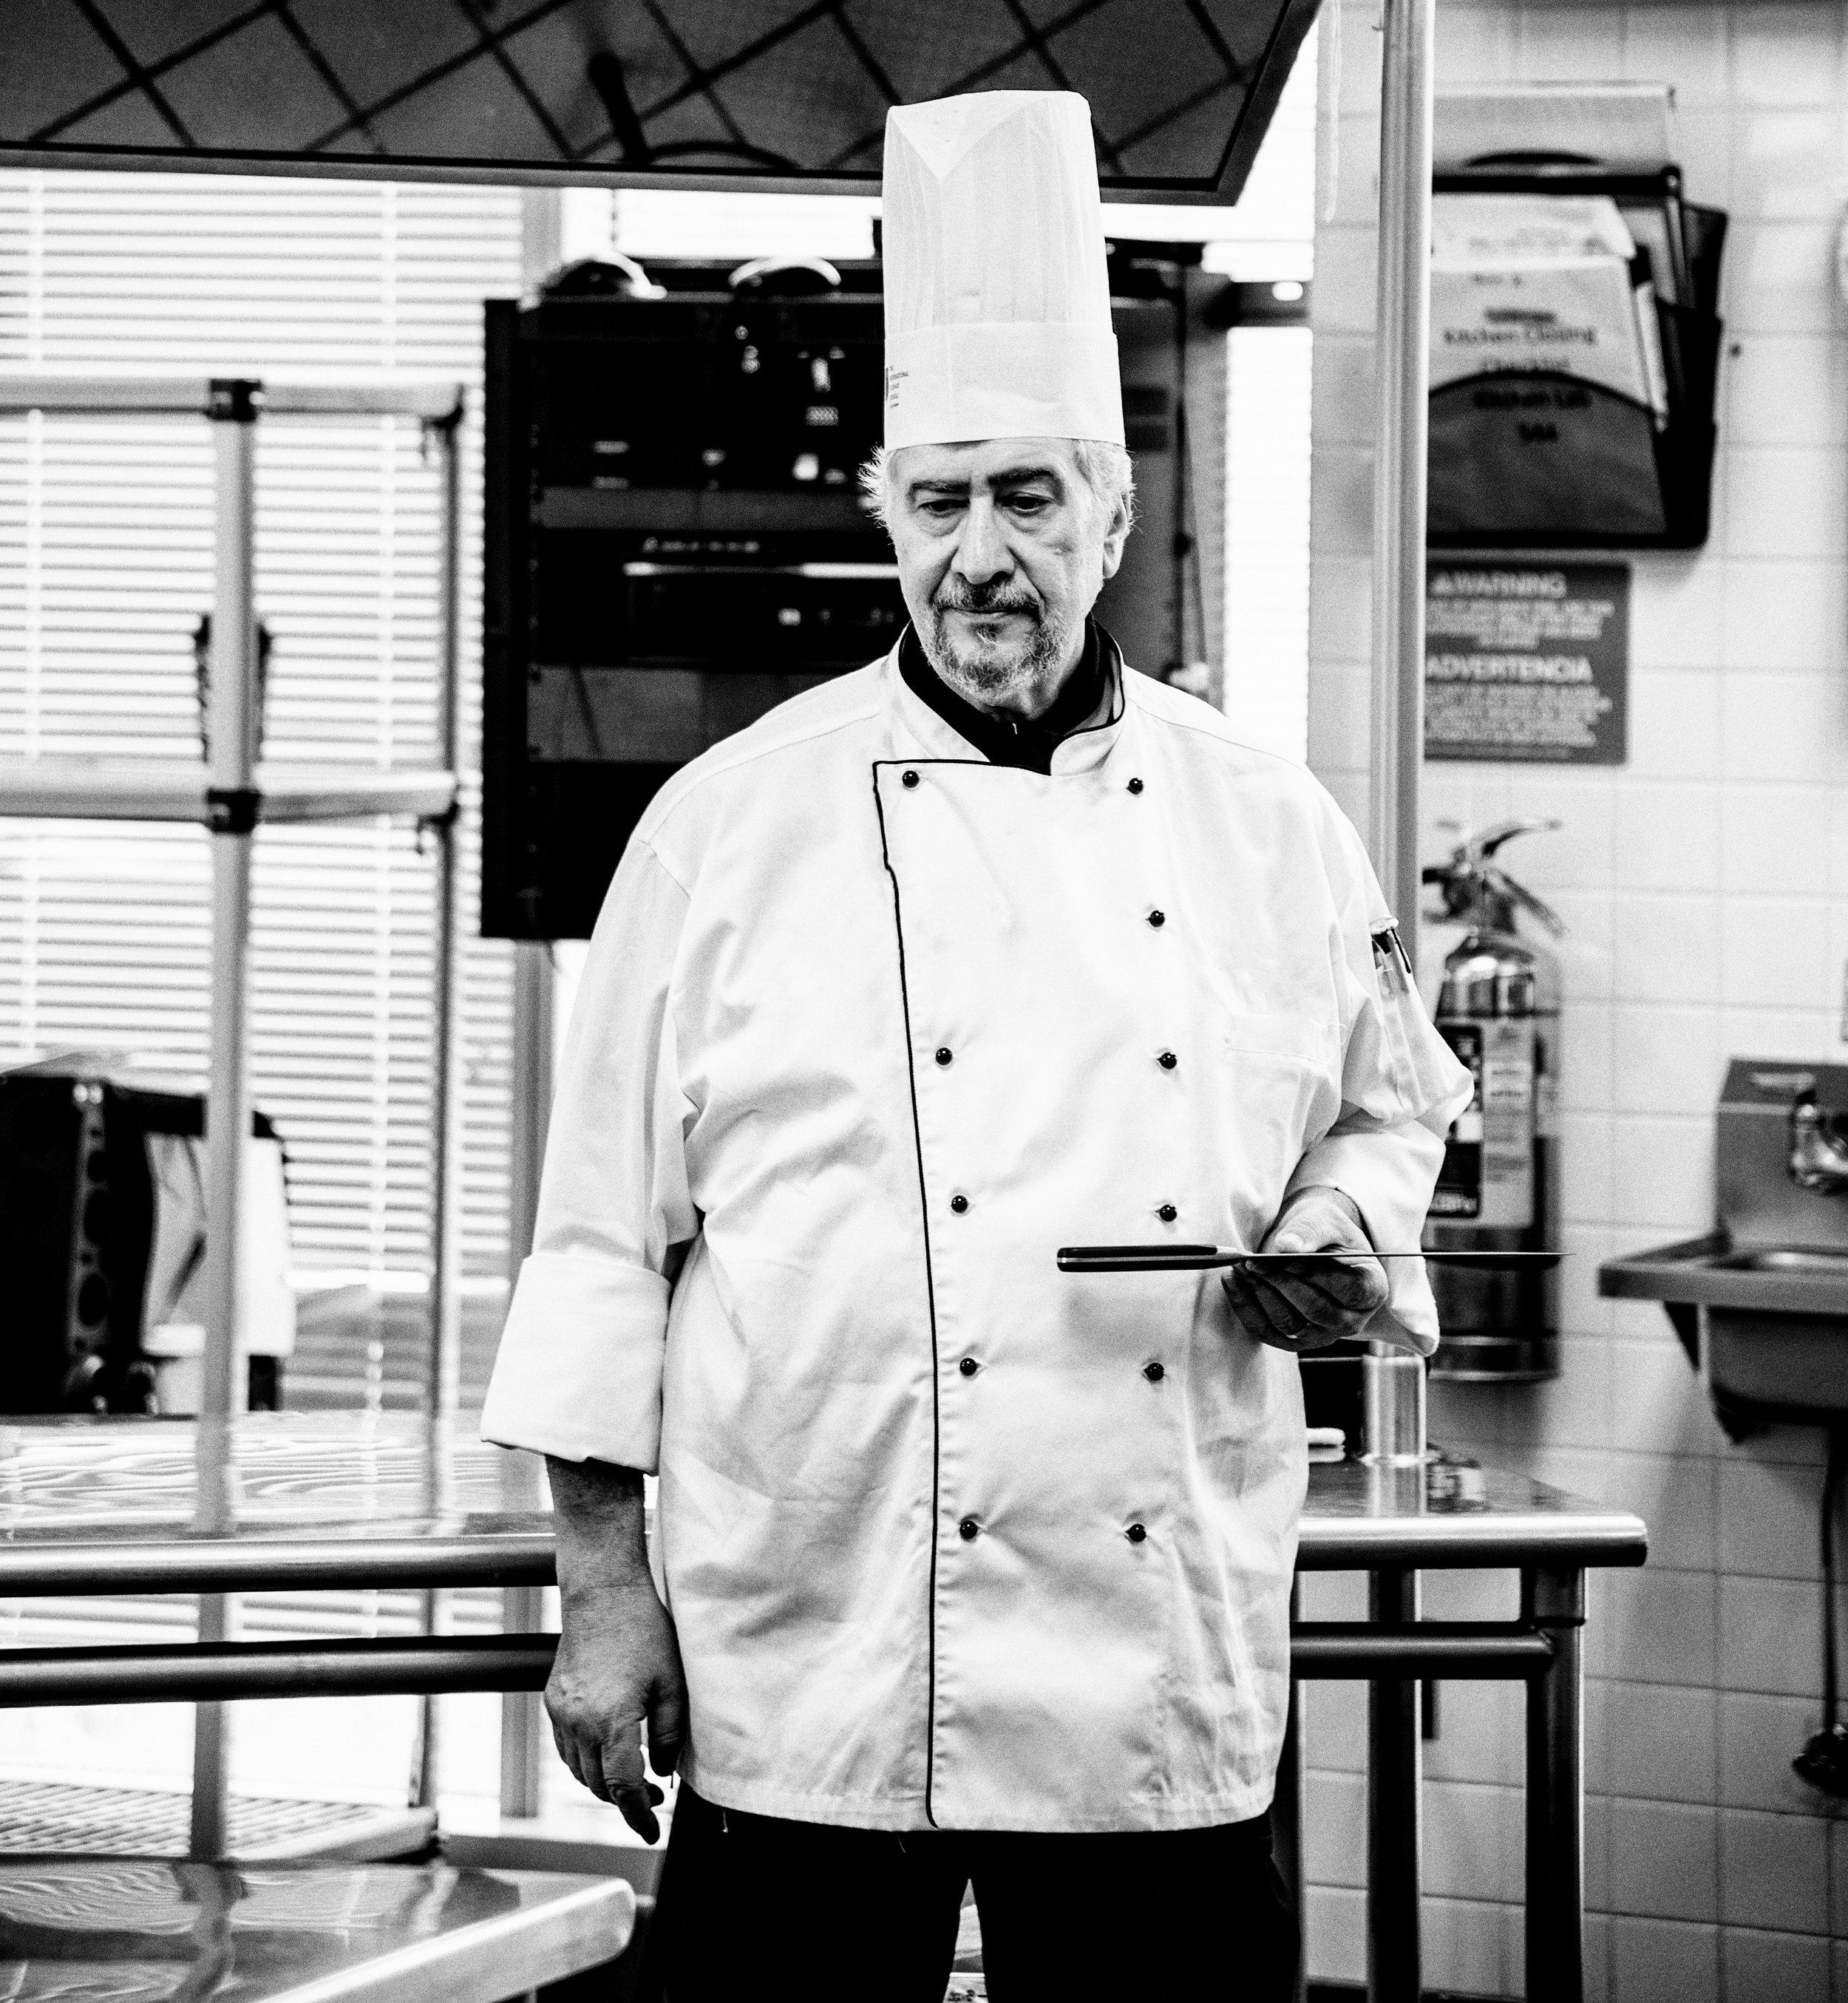 Chef1.jpg